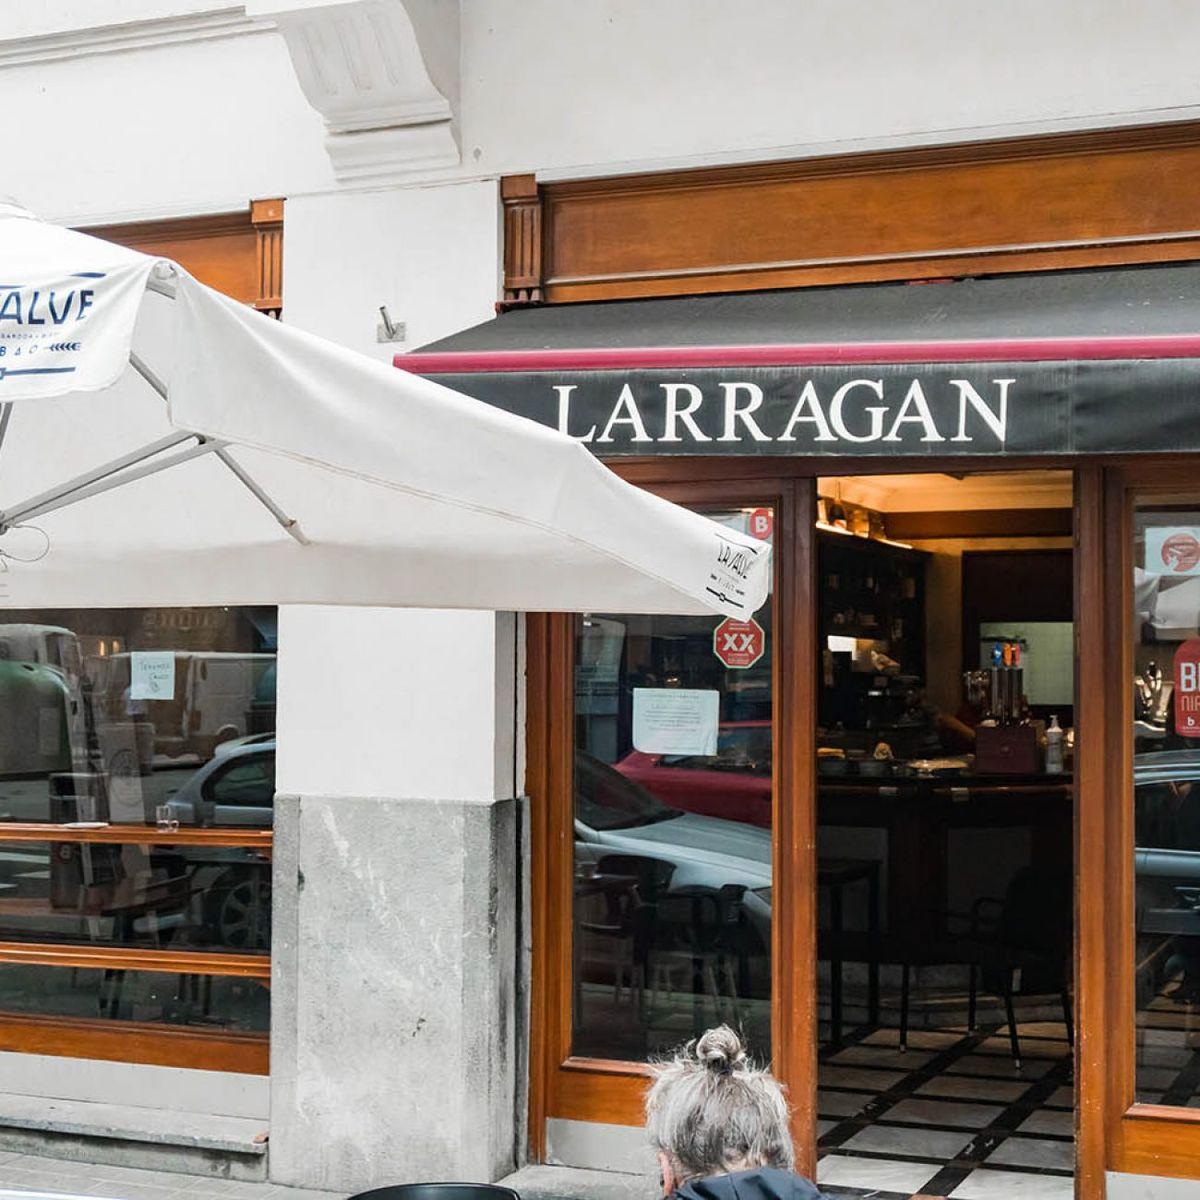 Larragan